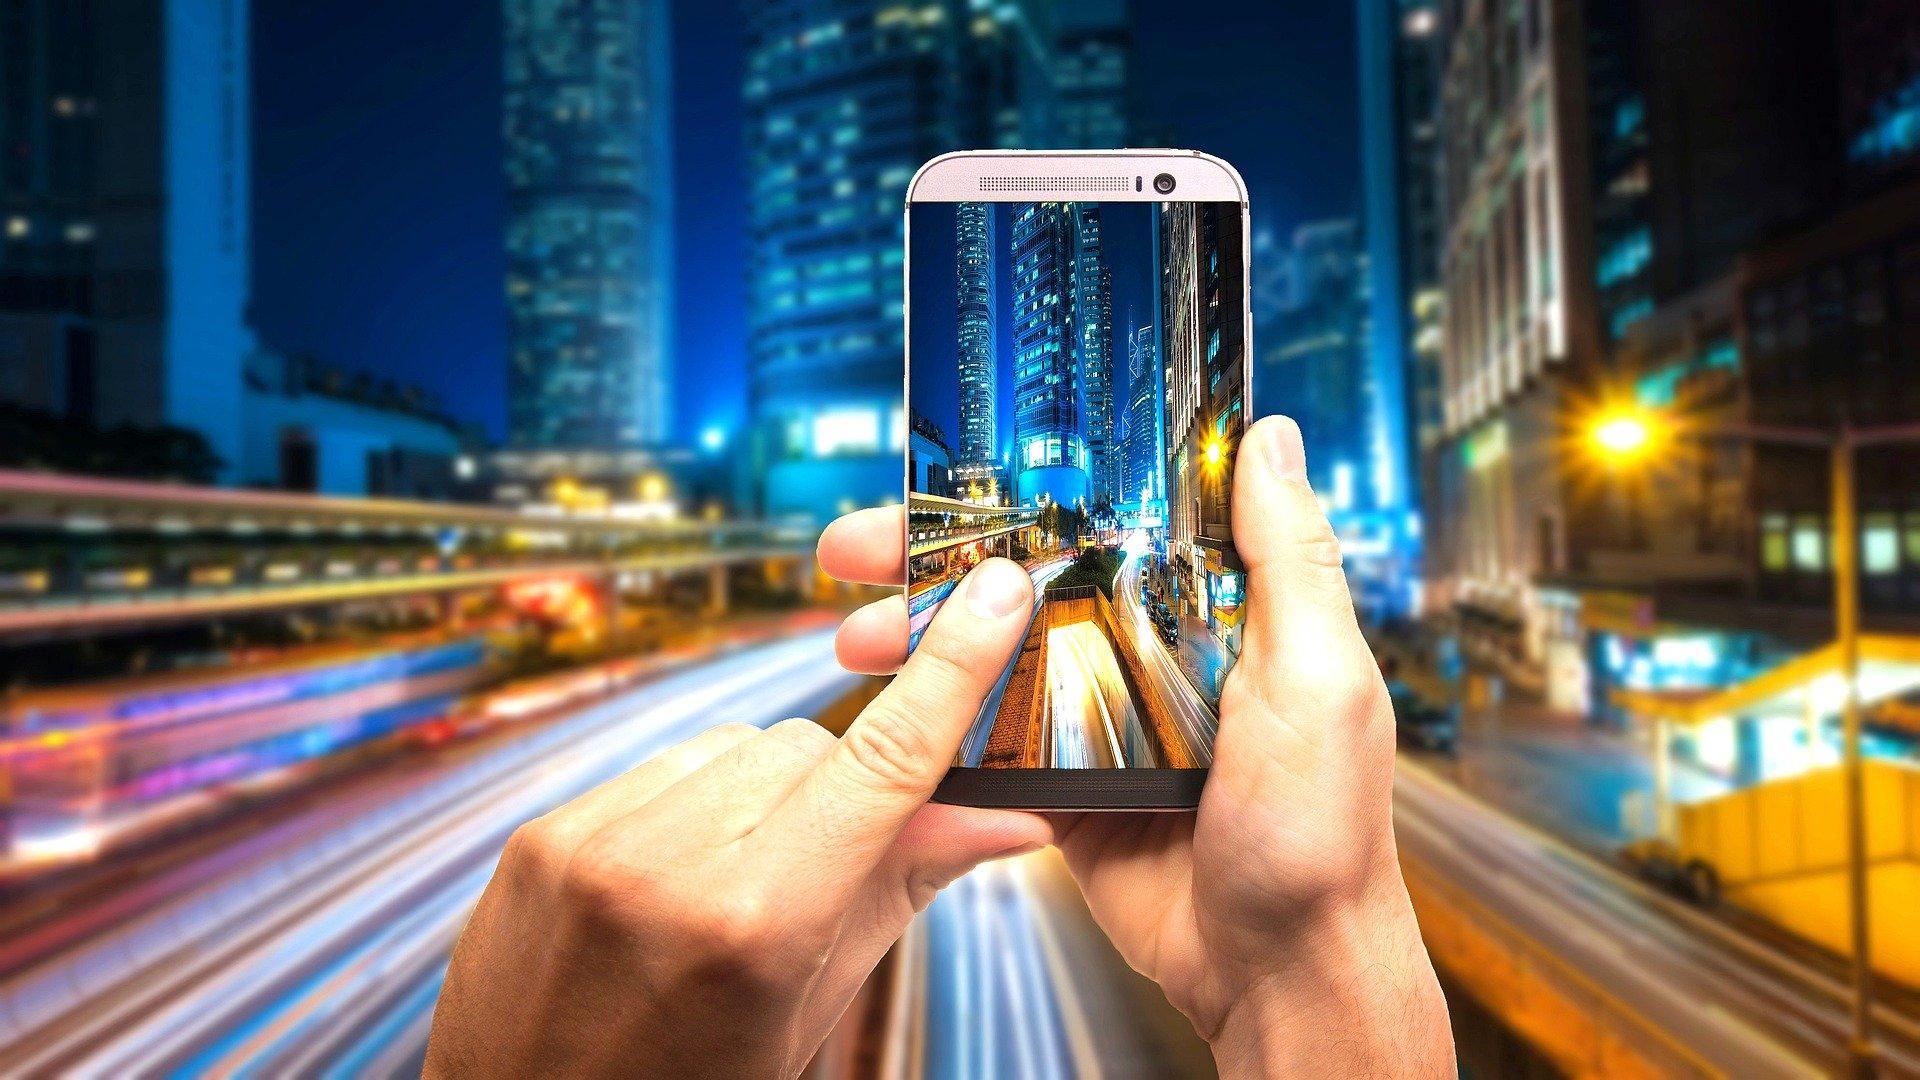 Камера смартфона сOIS, EIS или HIS? Кратко остабилизации изображения